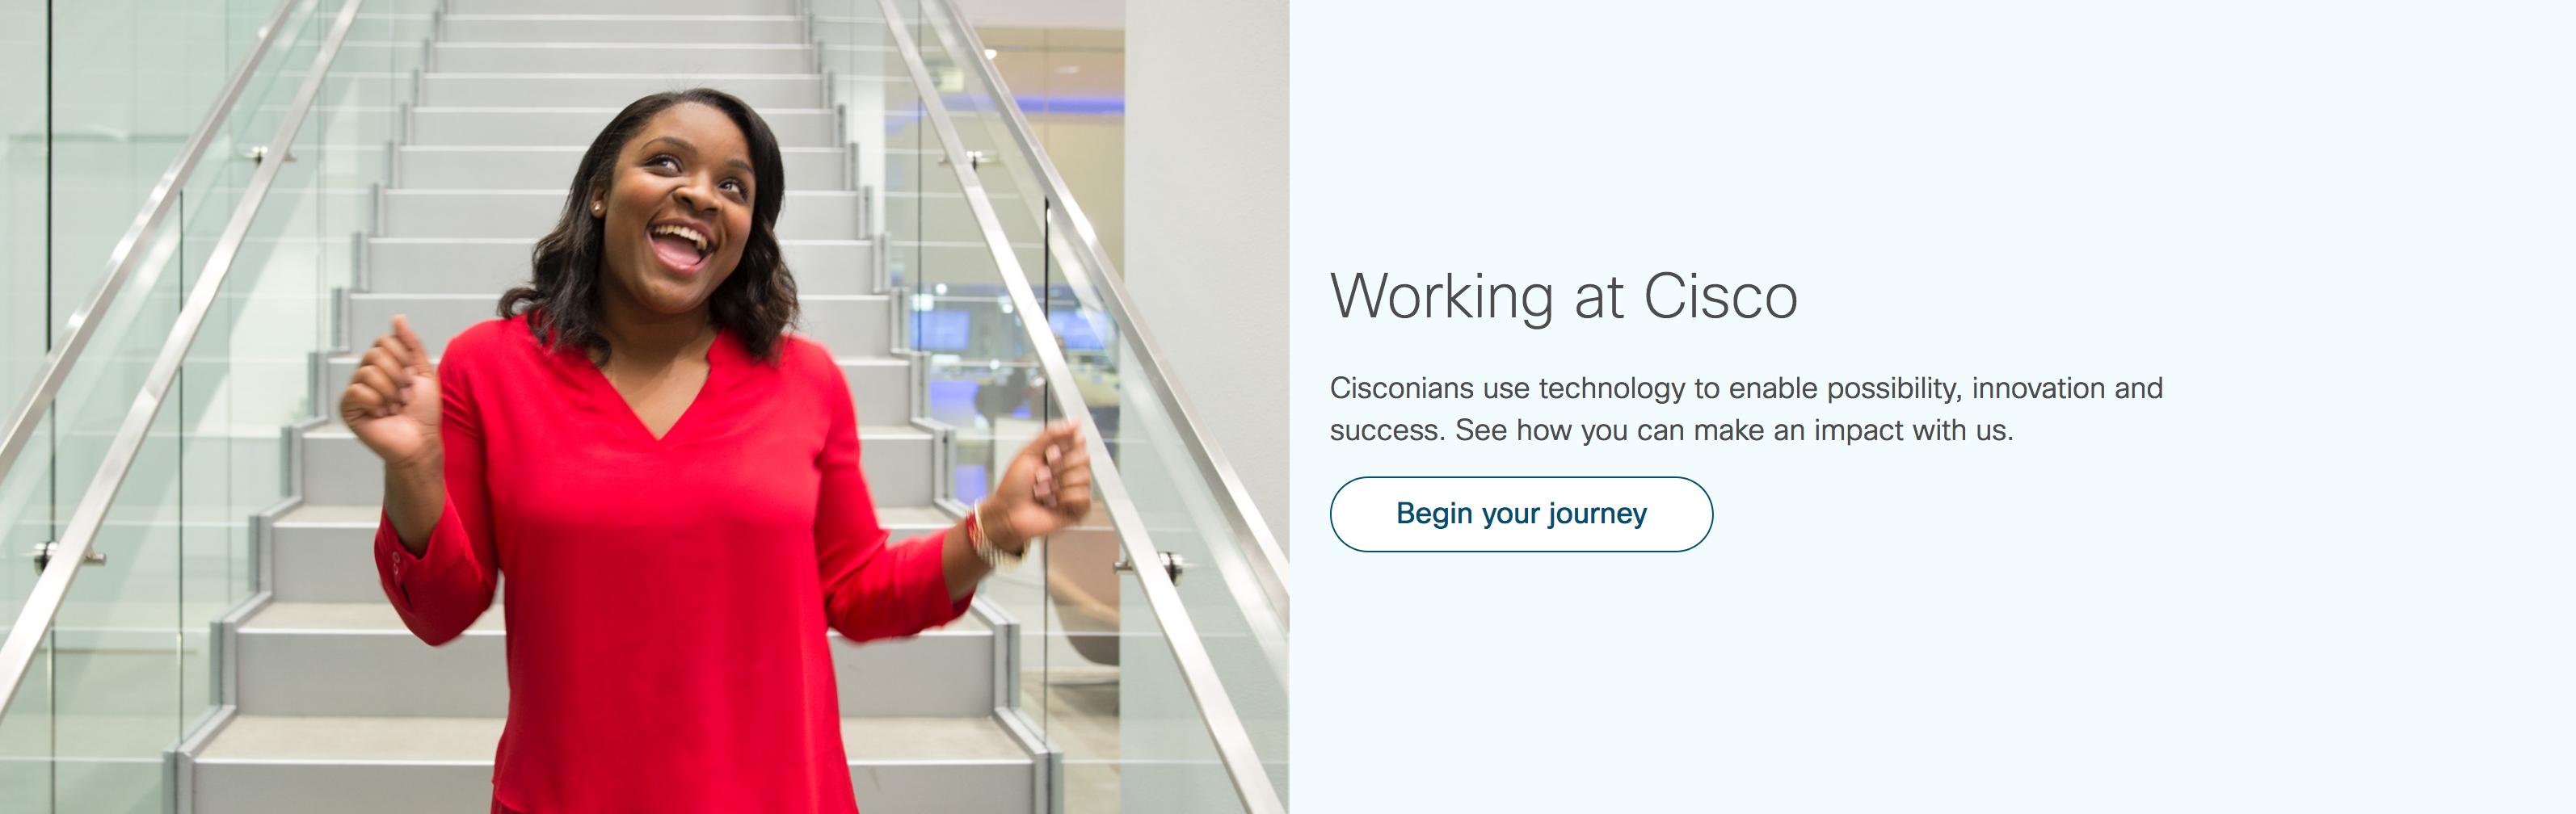 Euphorisierte Cisco Mitarbeiterin